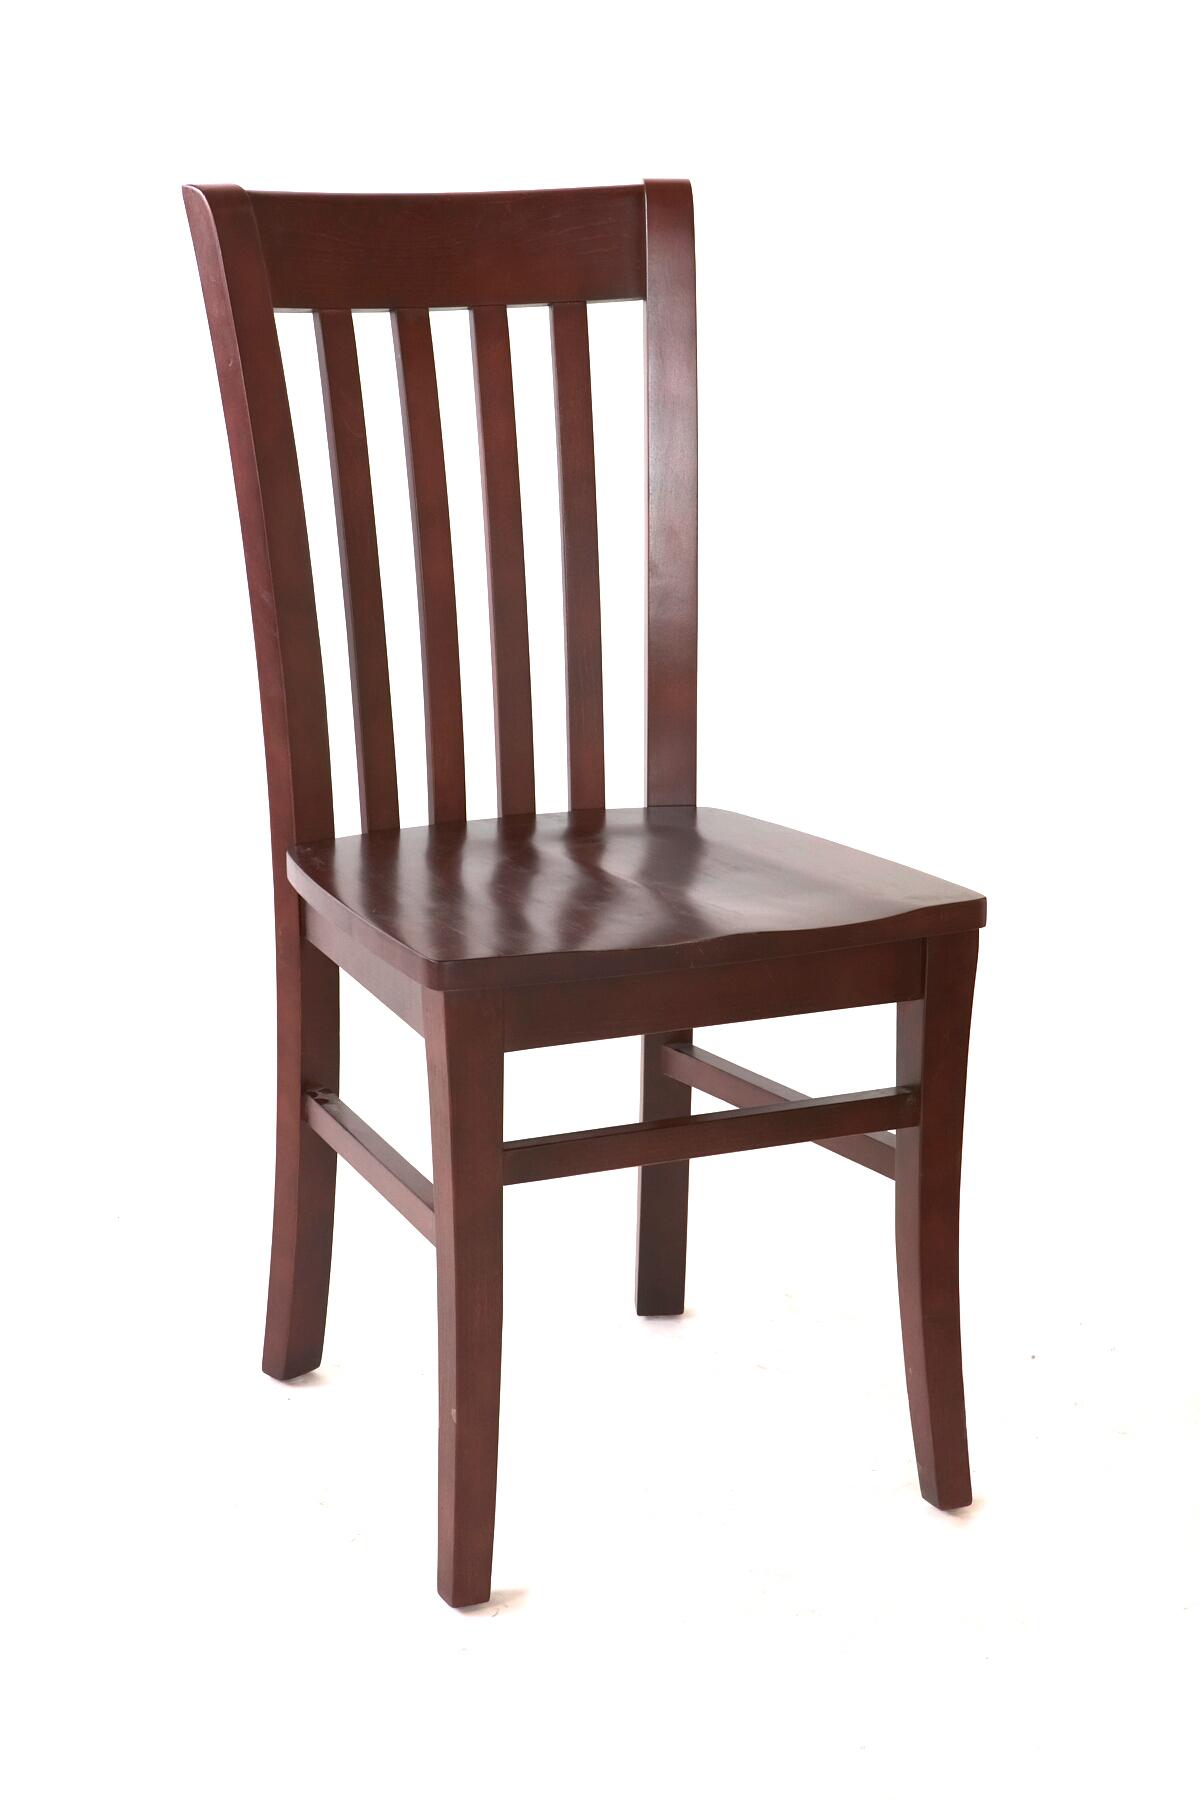 Seating Expert Inc. image 1